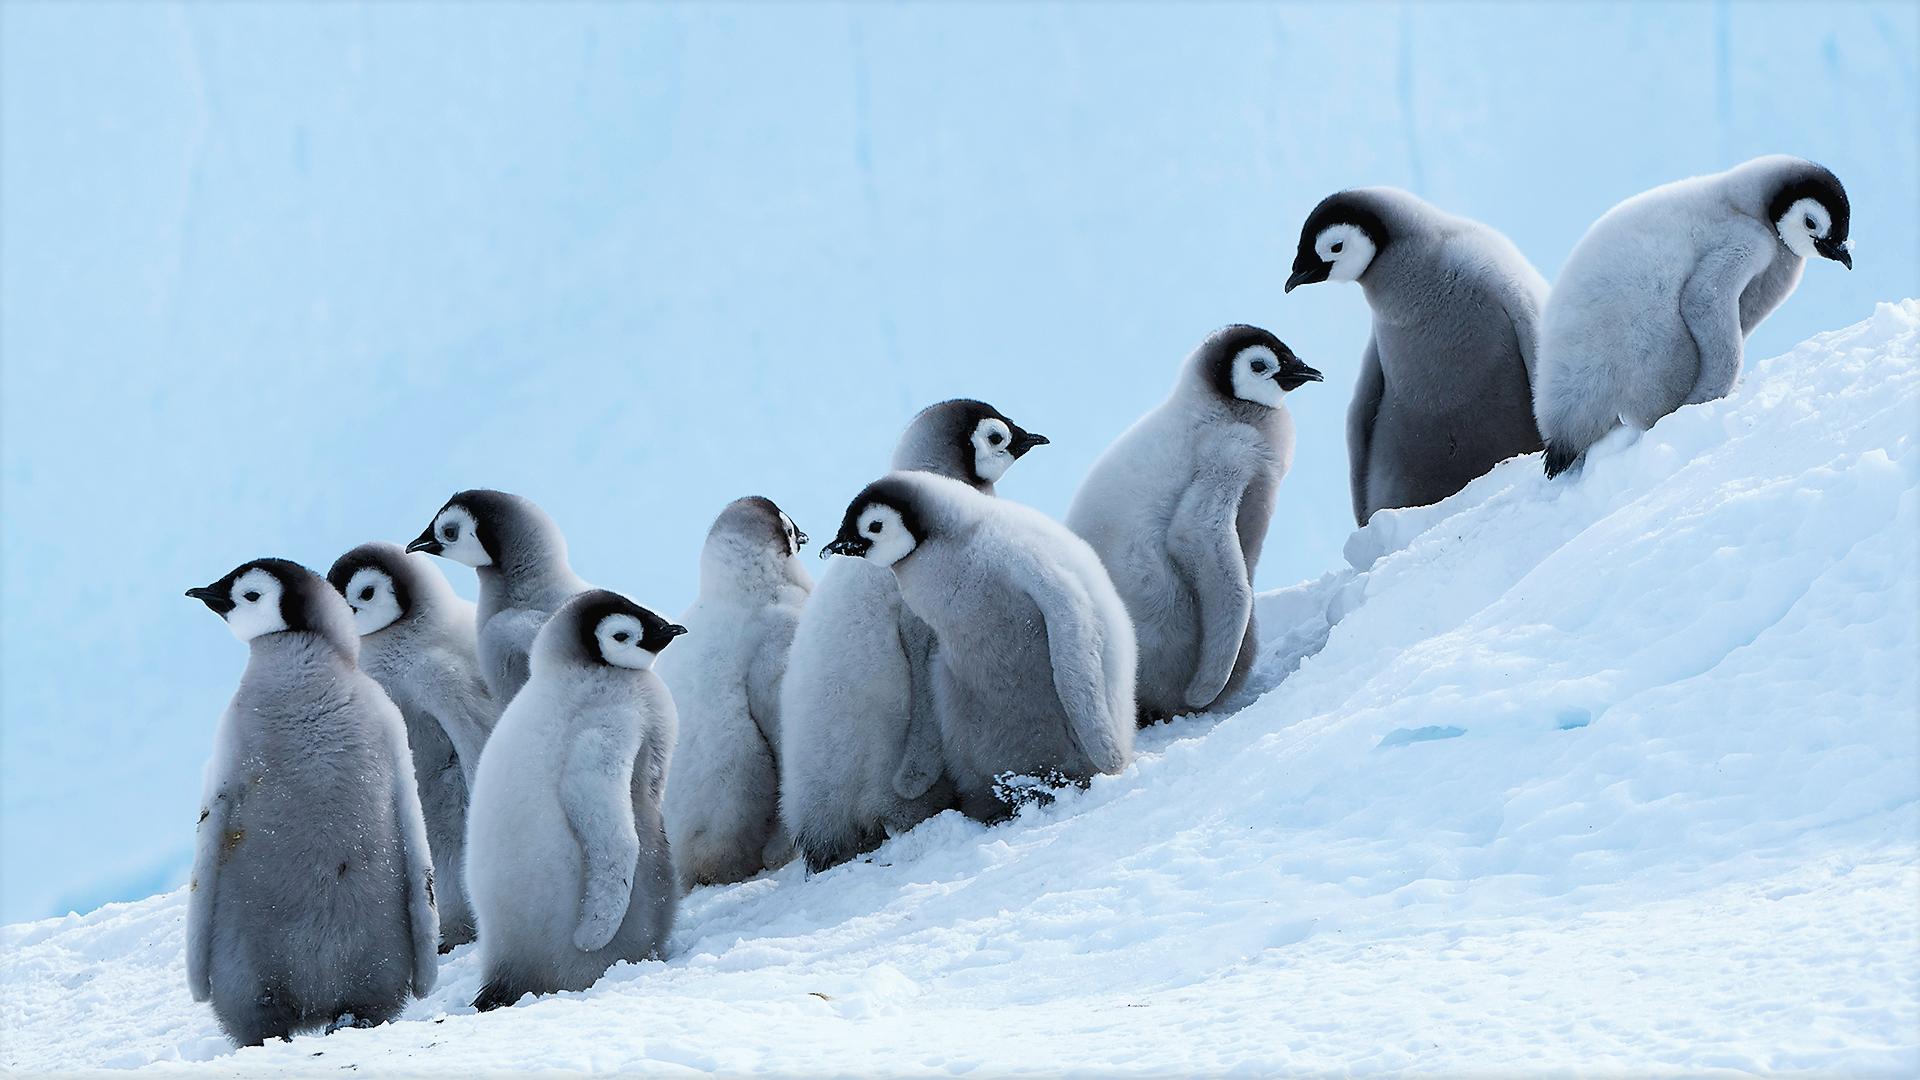 Adorable Baby Penguins In Snow Penguin Wallpaper Penguins Baby Penguins